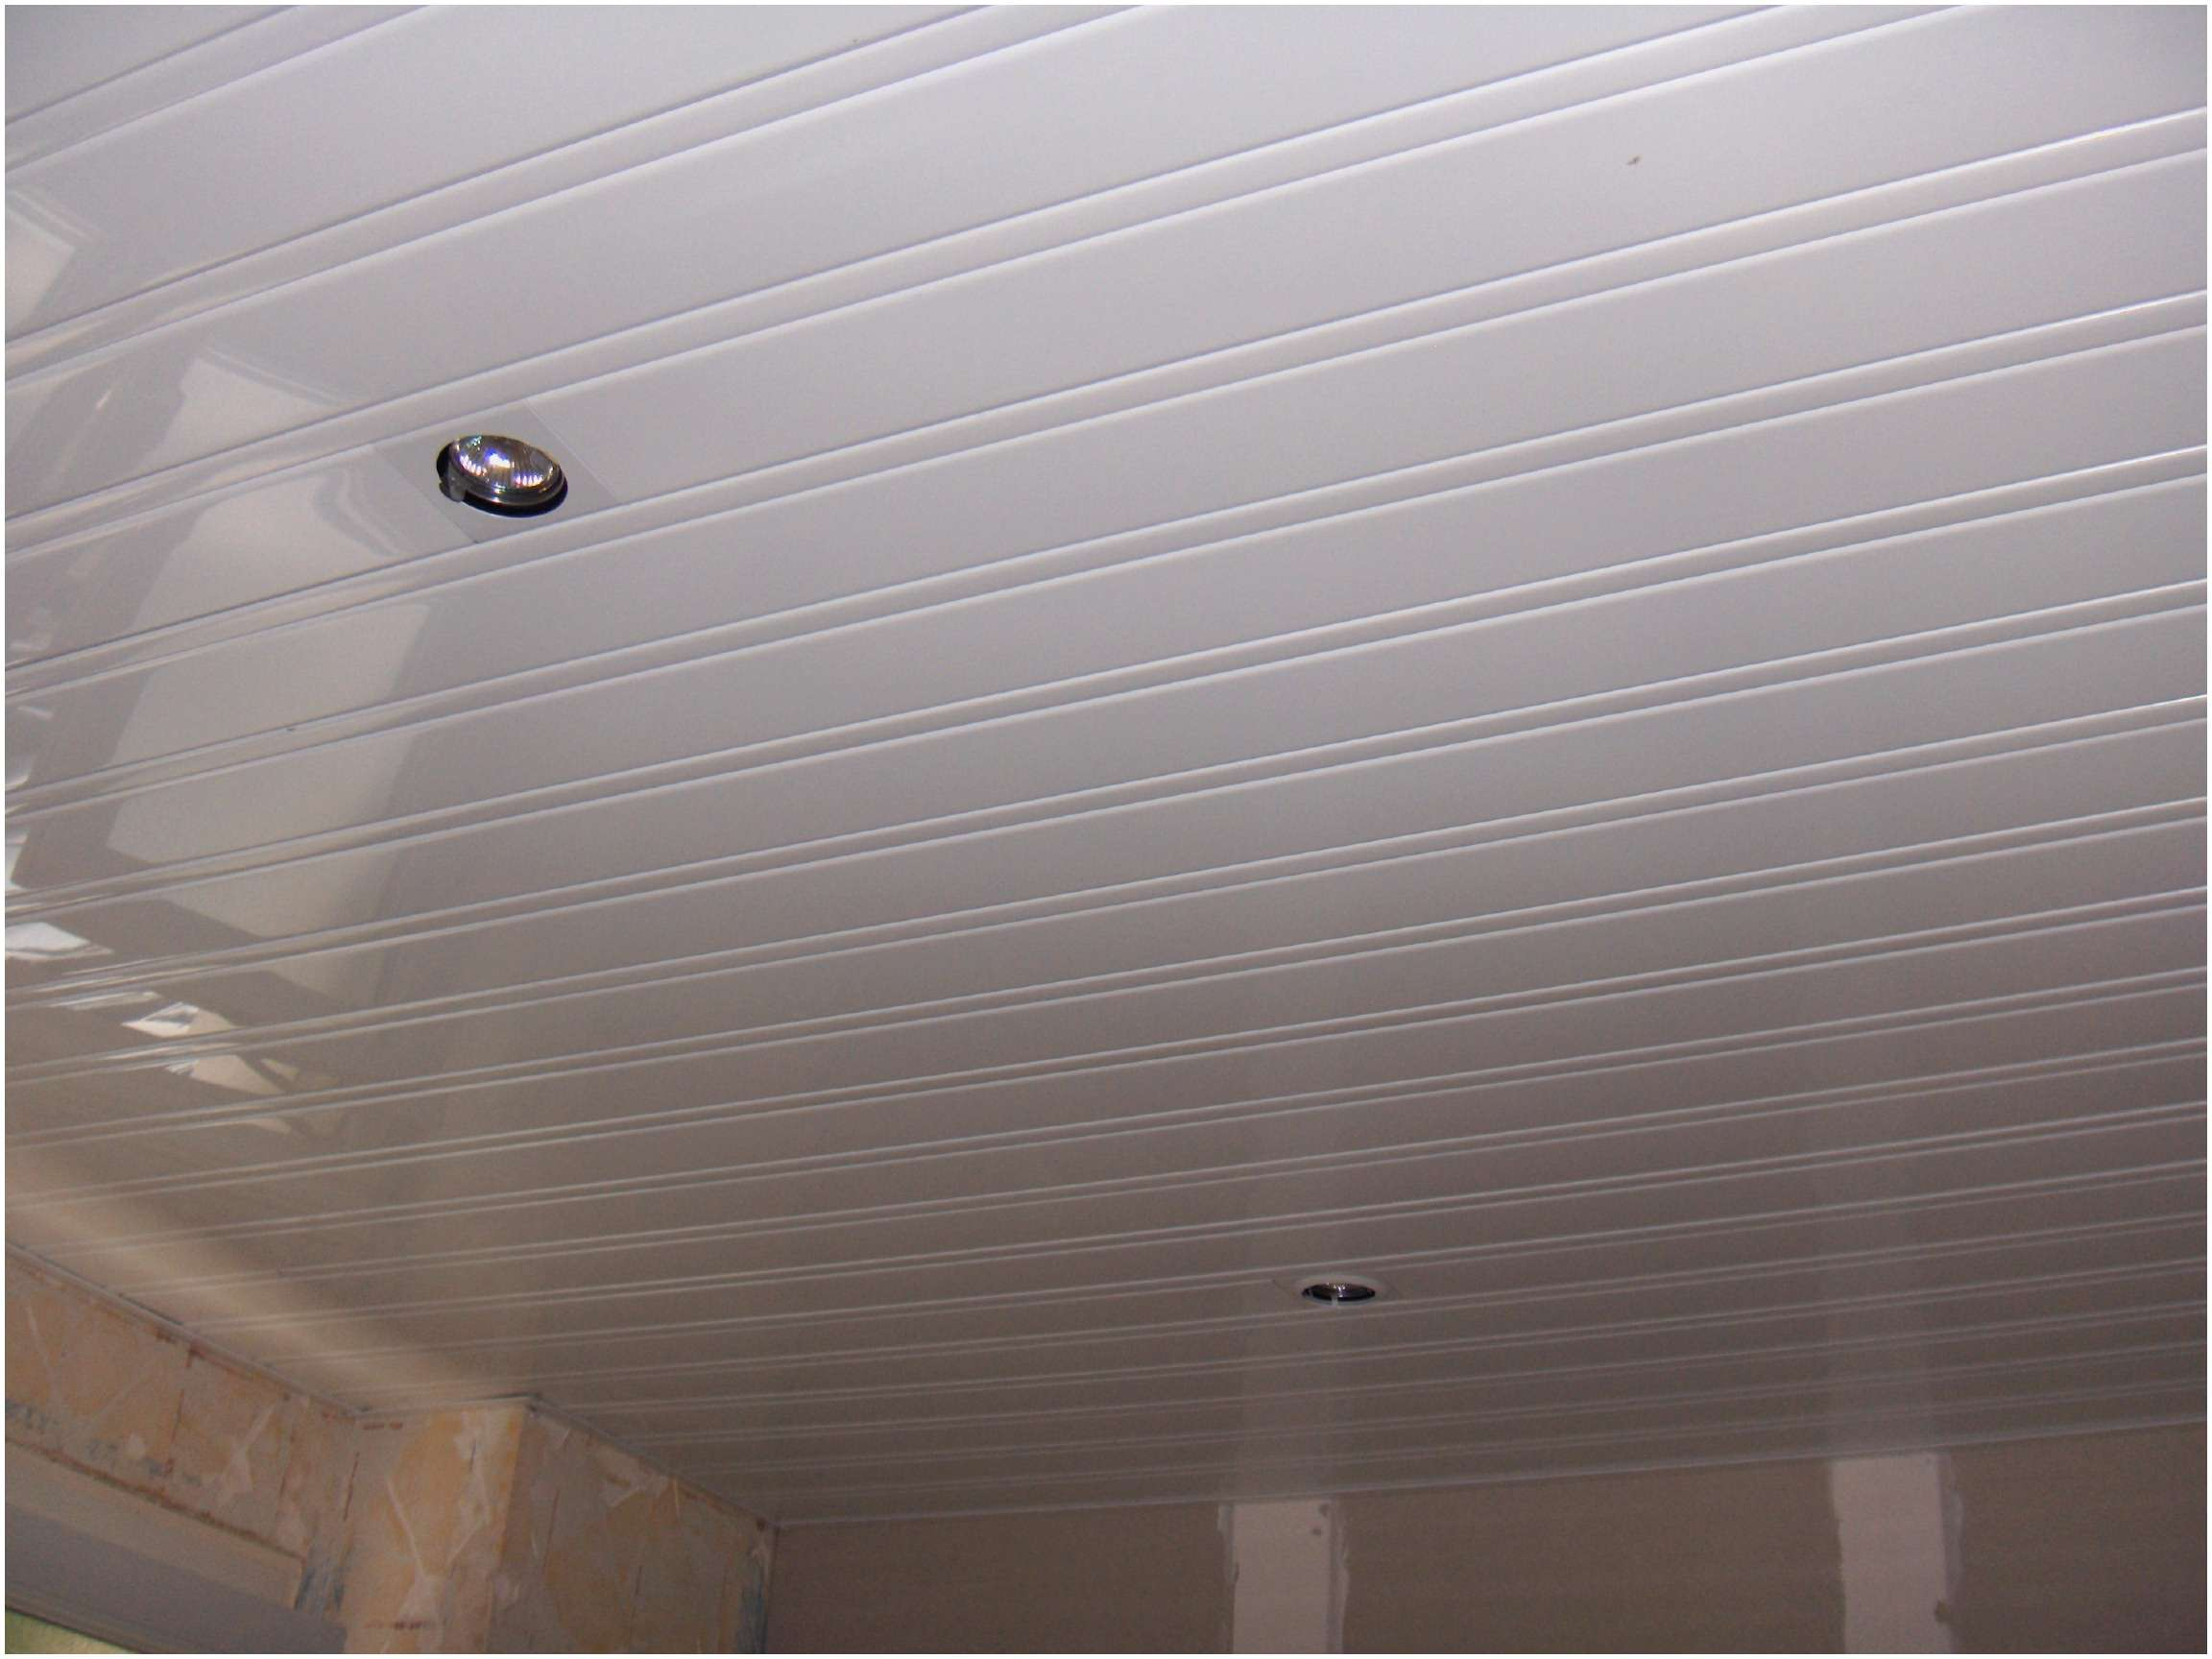 Dalle Faux Plafond 60×60 Brico Depot – Gamboahinestrosa encequiconcerne Dalle Faux Plafond 60X60 Brico Depot